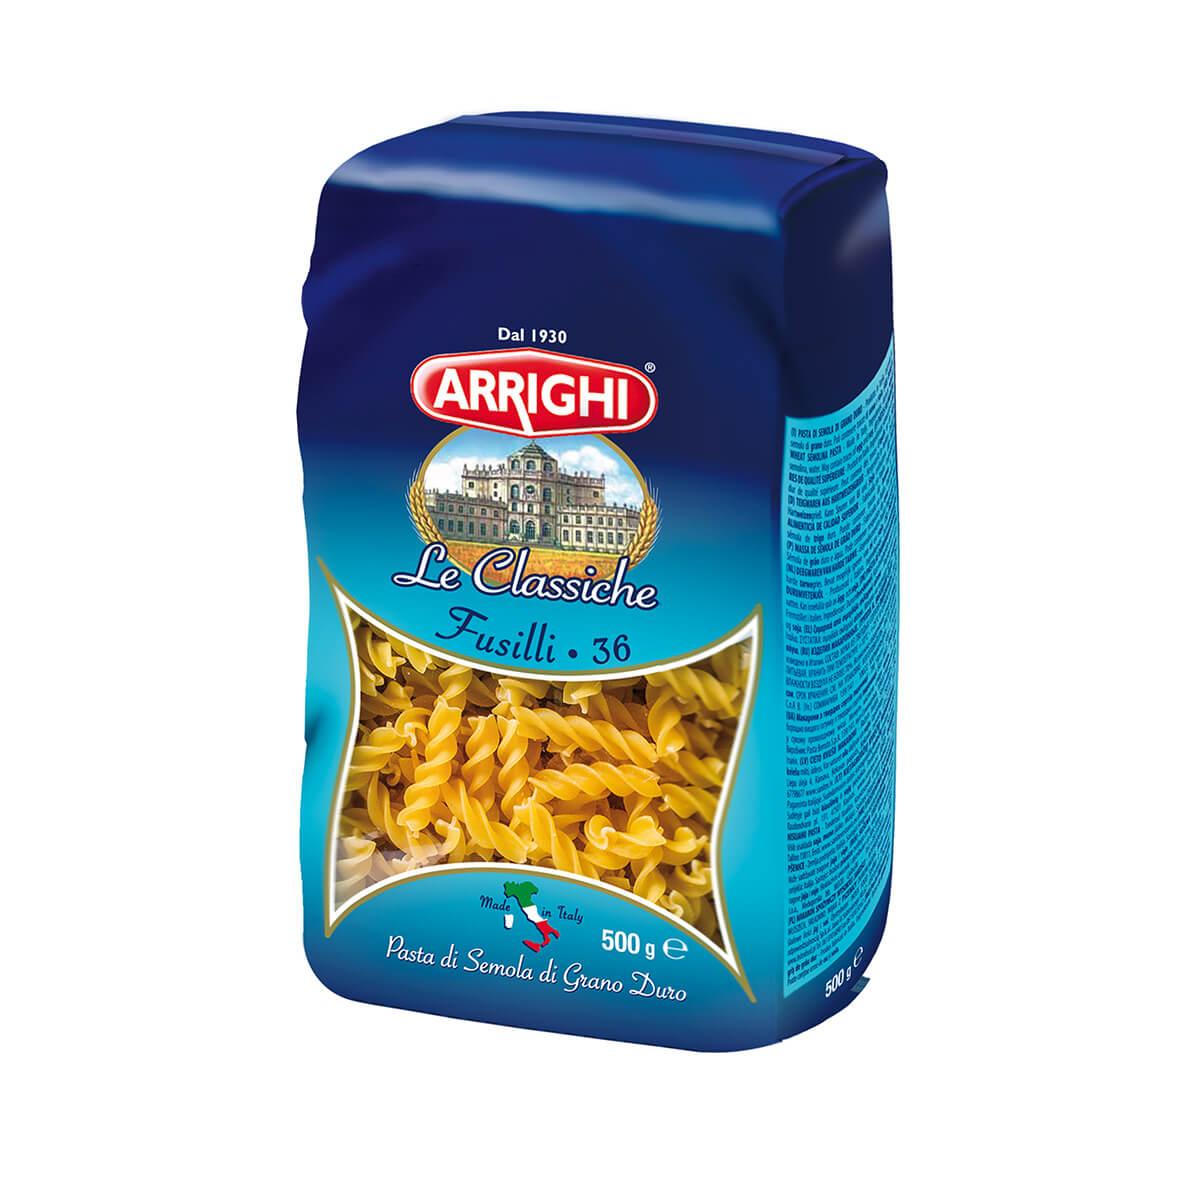 Golden Grains Arrighi - Fusilli - Front (1).jpg